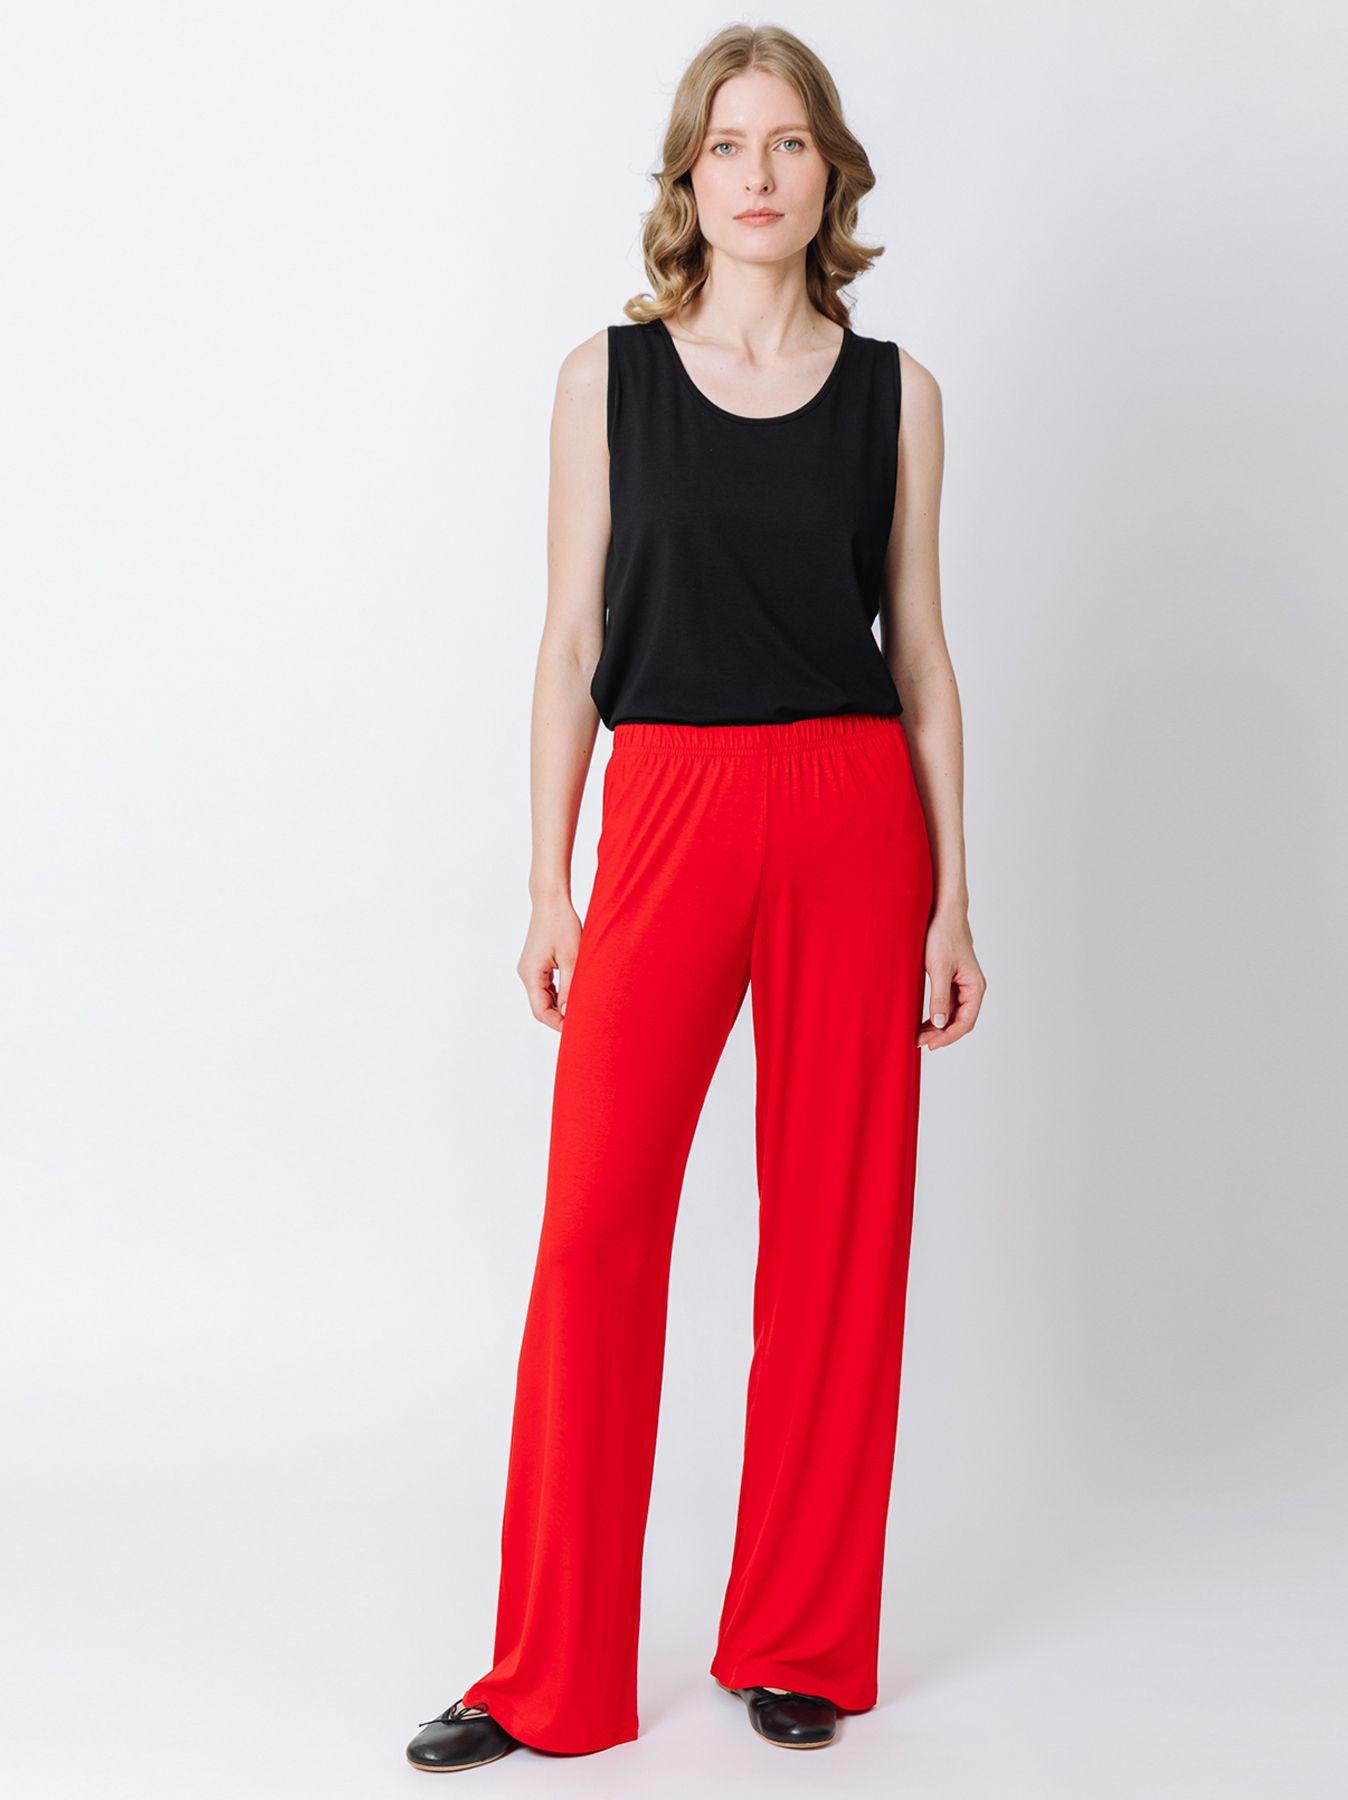 Pantalone elastico ROSSO